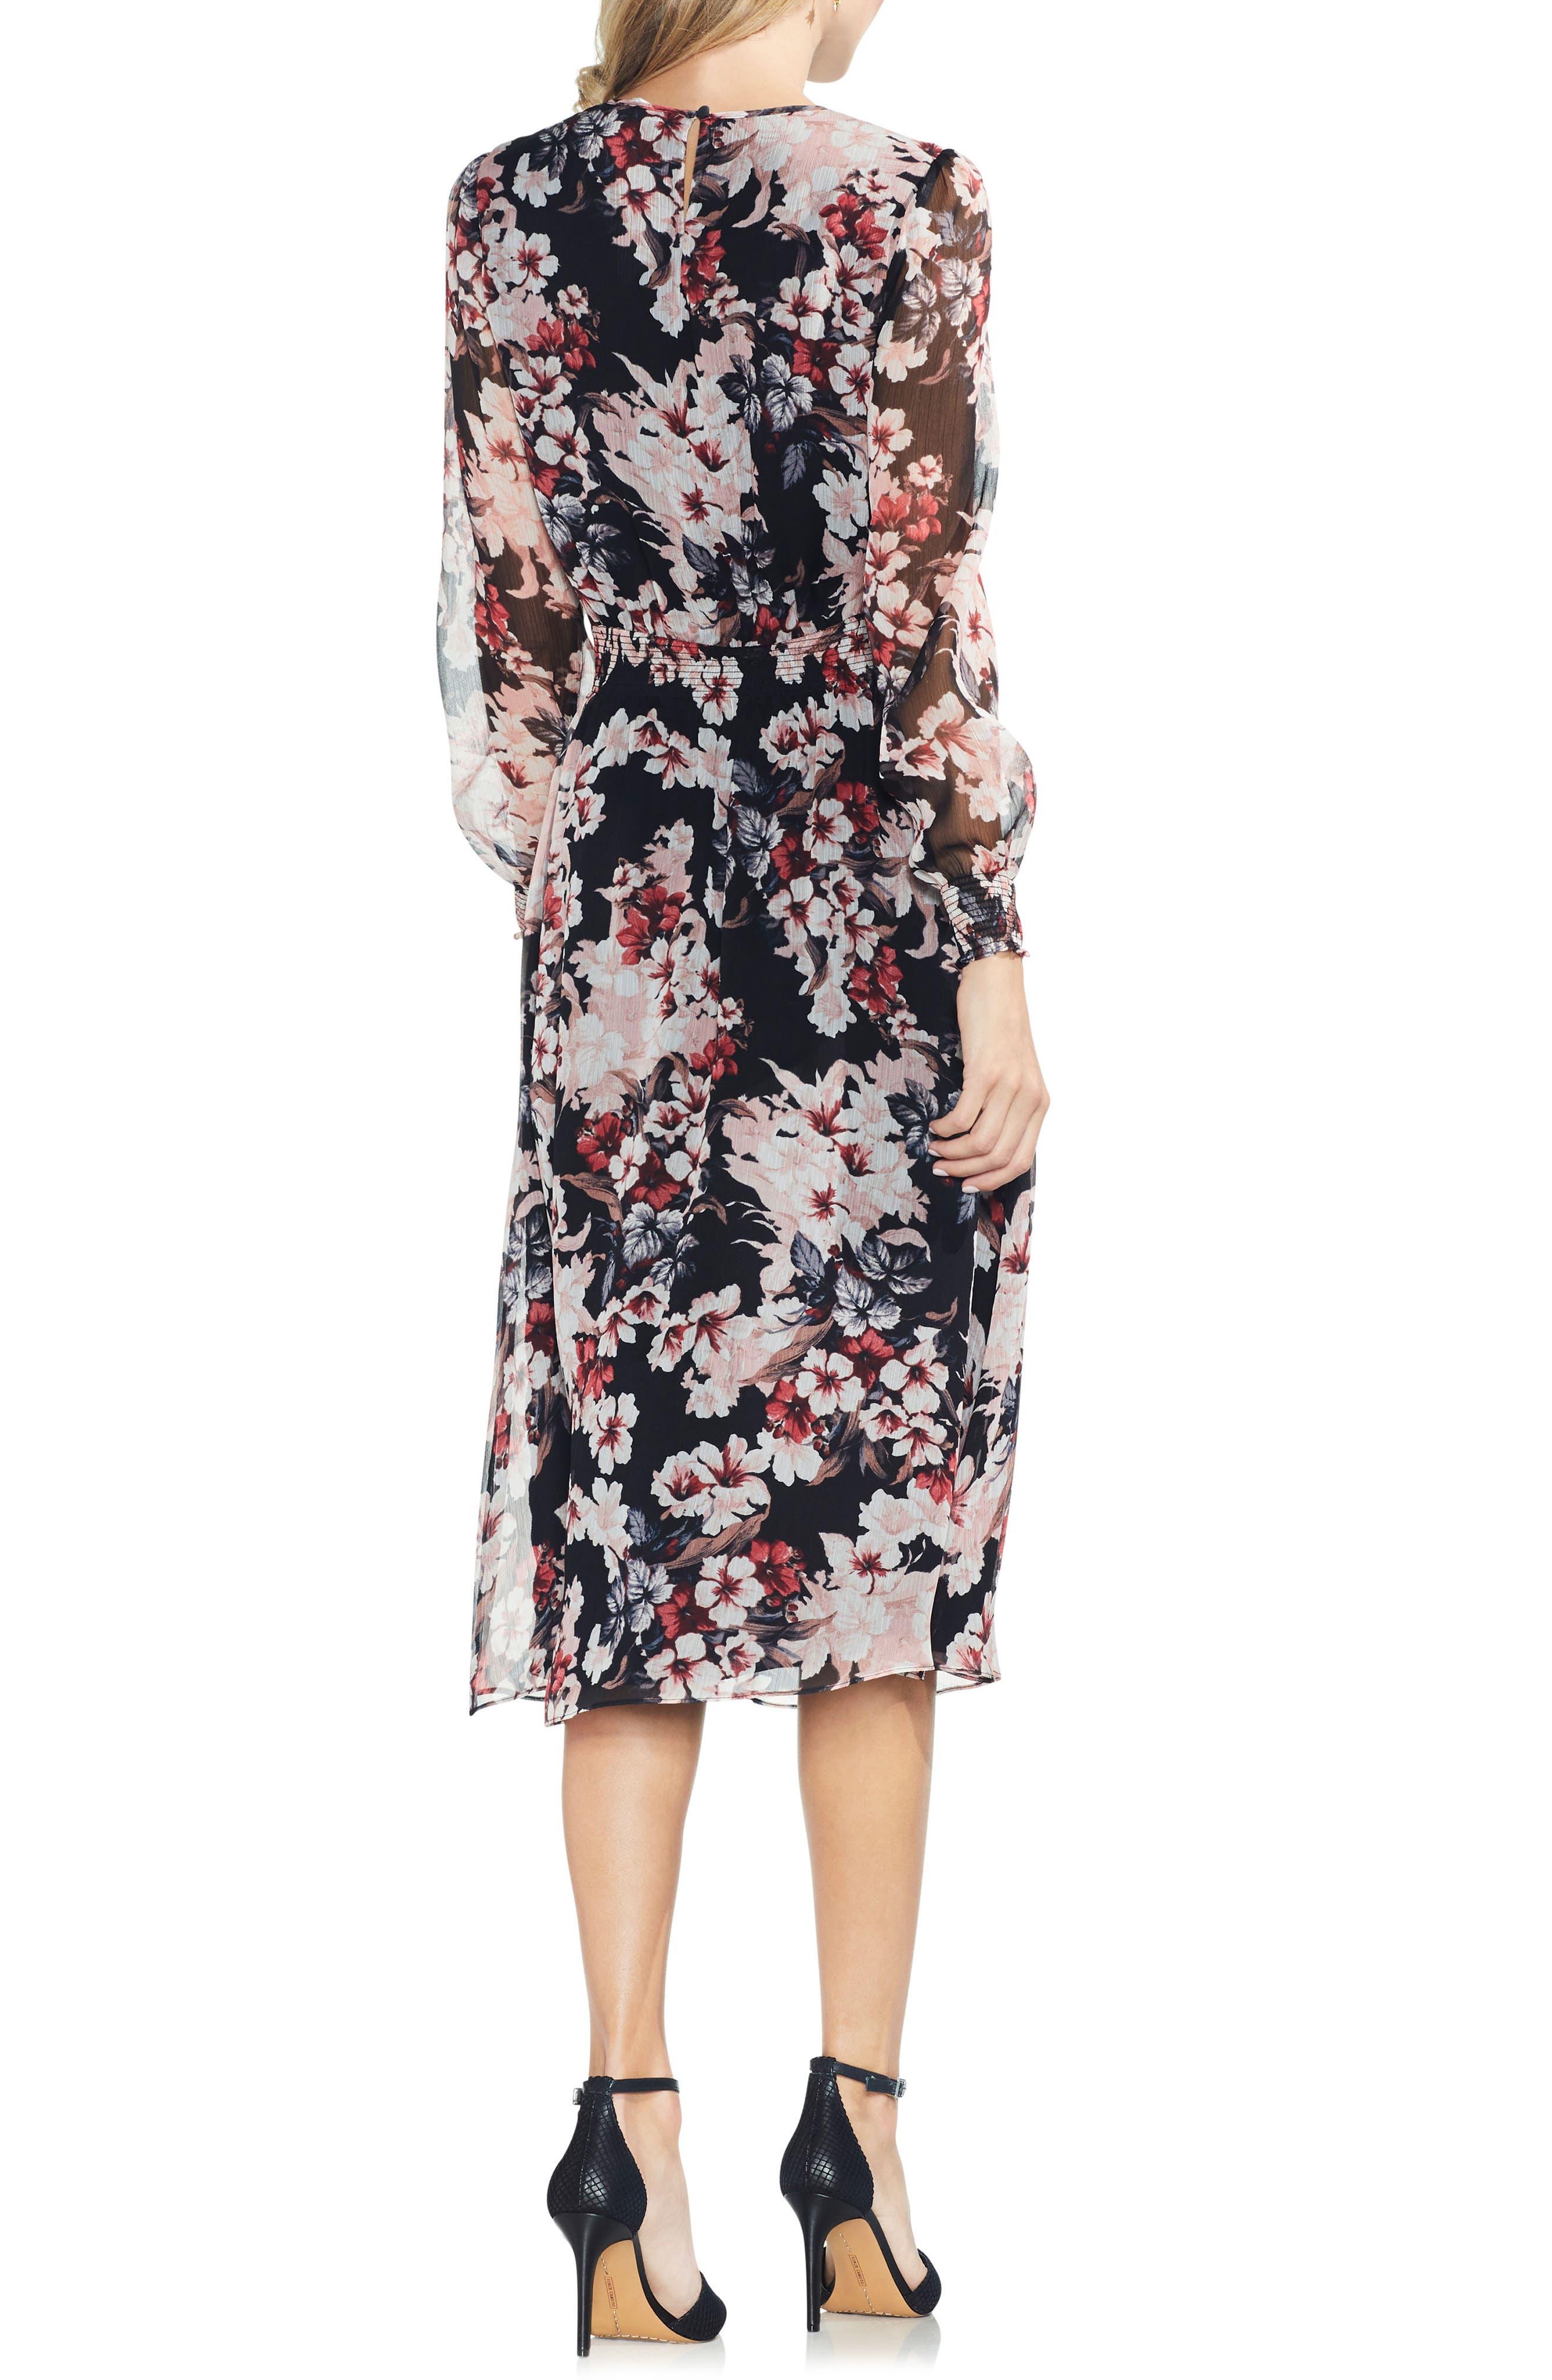 VINCE CAMUTO,                             Timeless Blooms Cinch Waist Midi Dress,                             Alternate thumbnail 2, color,                             006